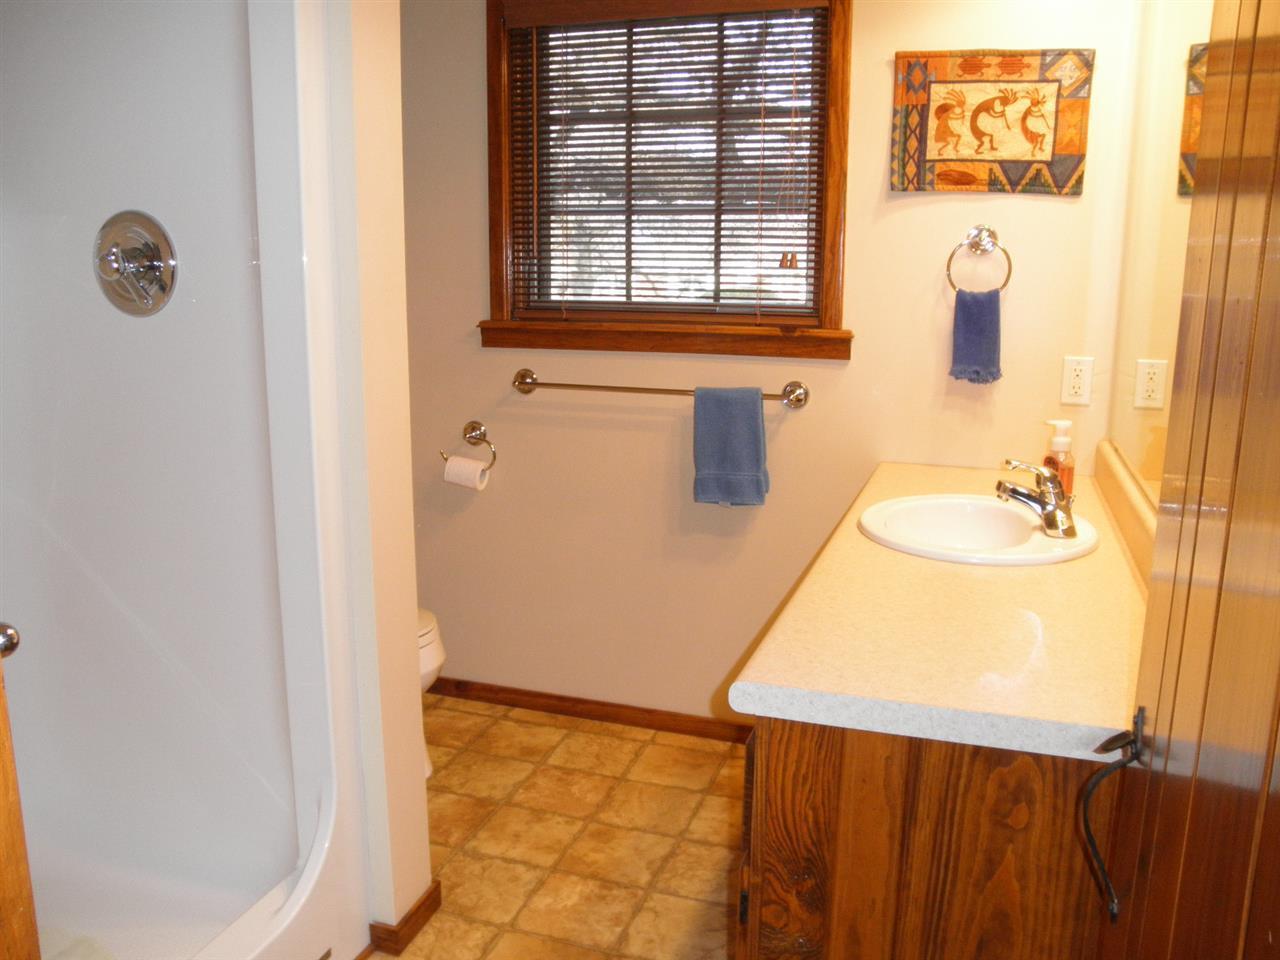 Sold Cross Sale W/ MLS | 88 Elmwood  Ponca City, OK 74601 29